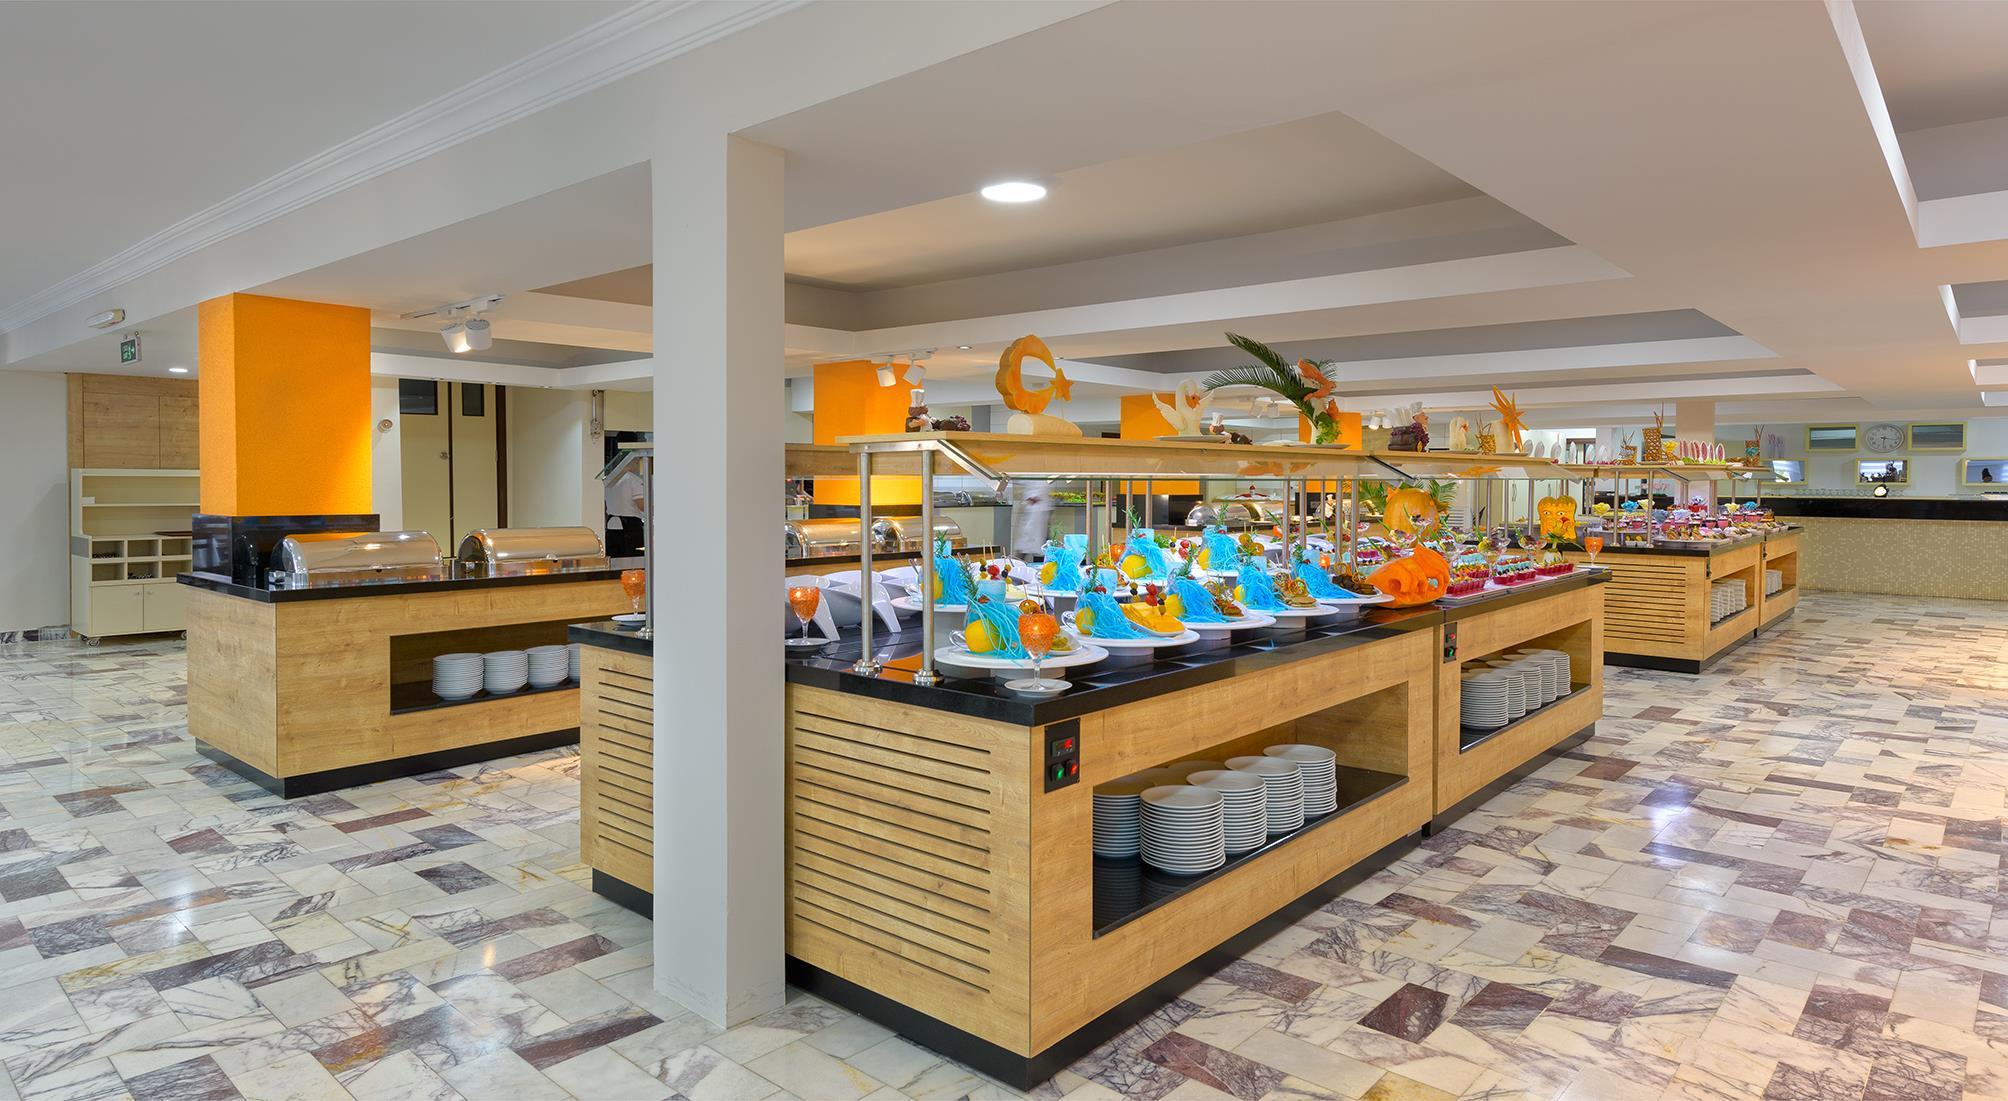 http://www.orextravel.sk/OREX/hotelphotos/club-sidelya-hotel-general-0017.jpg